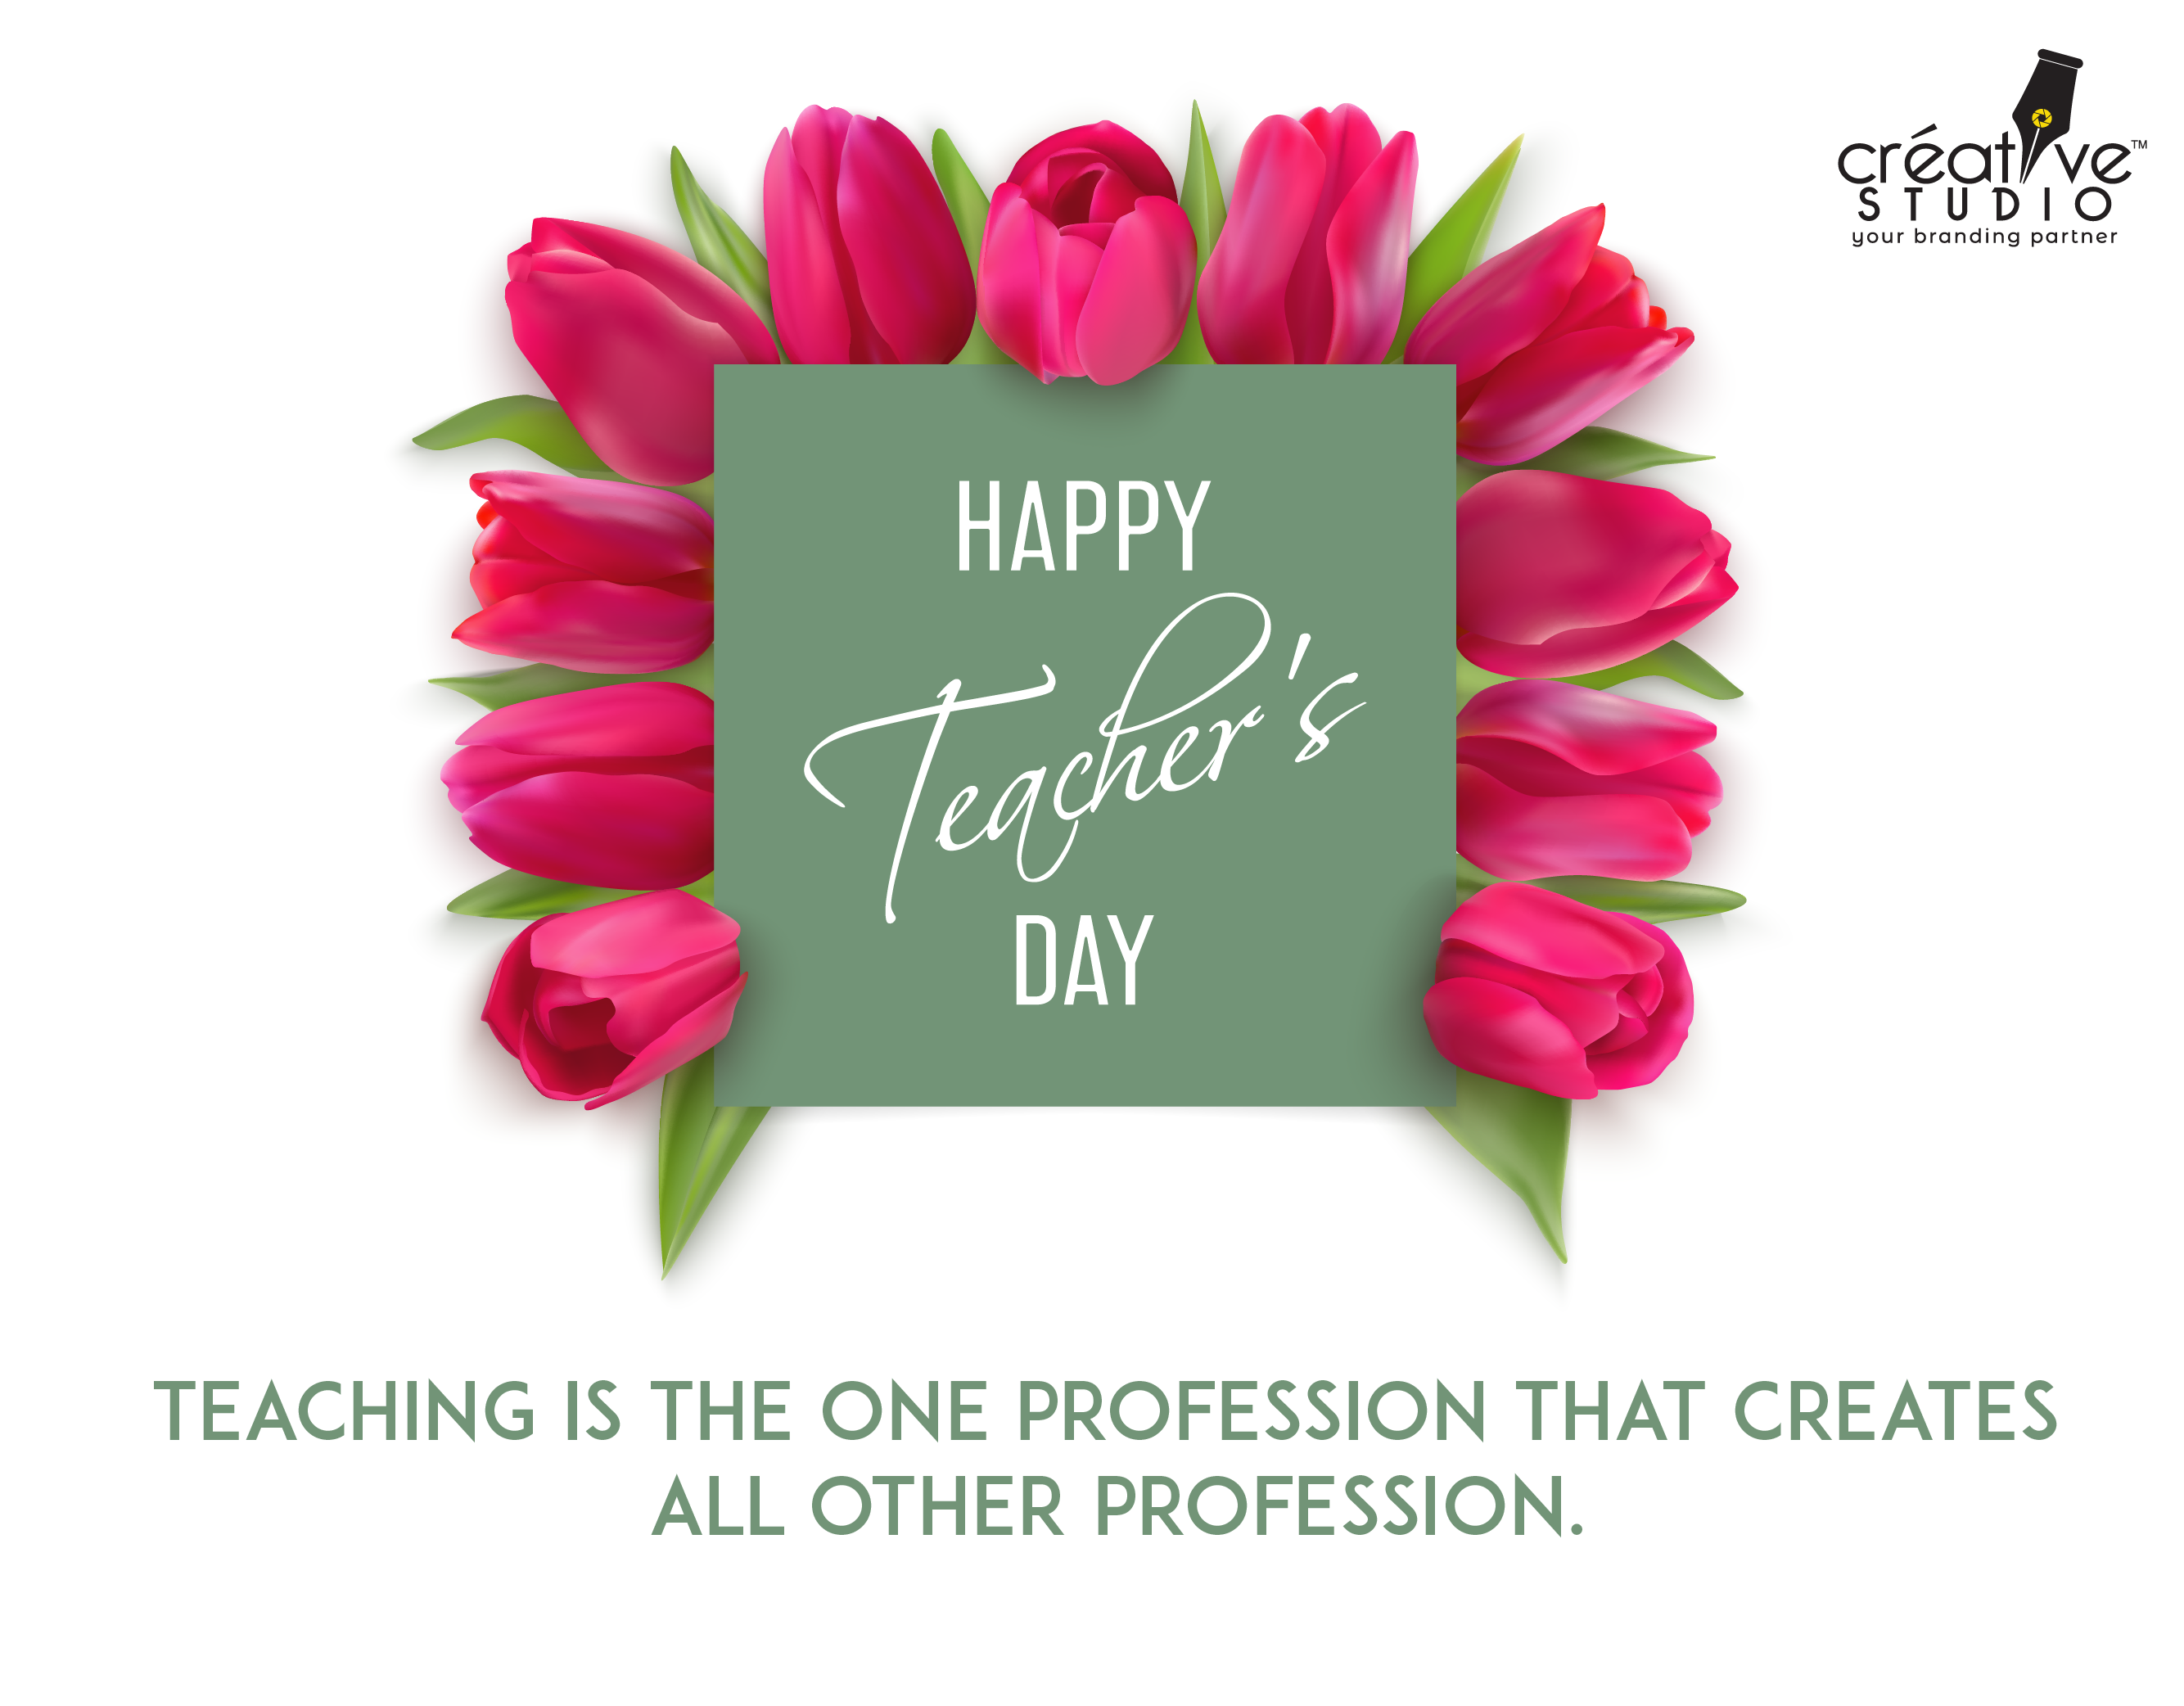 TEACHERS DAY 05 - Teachers Day